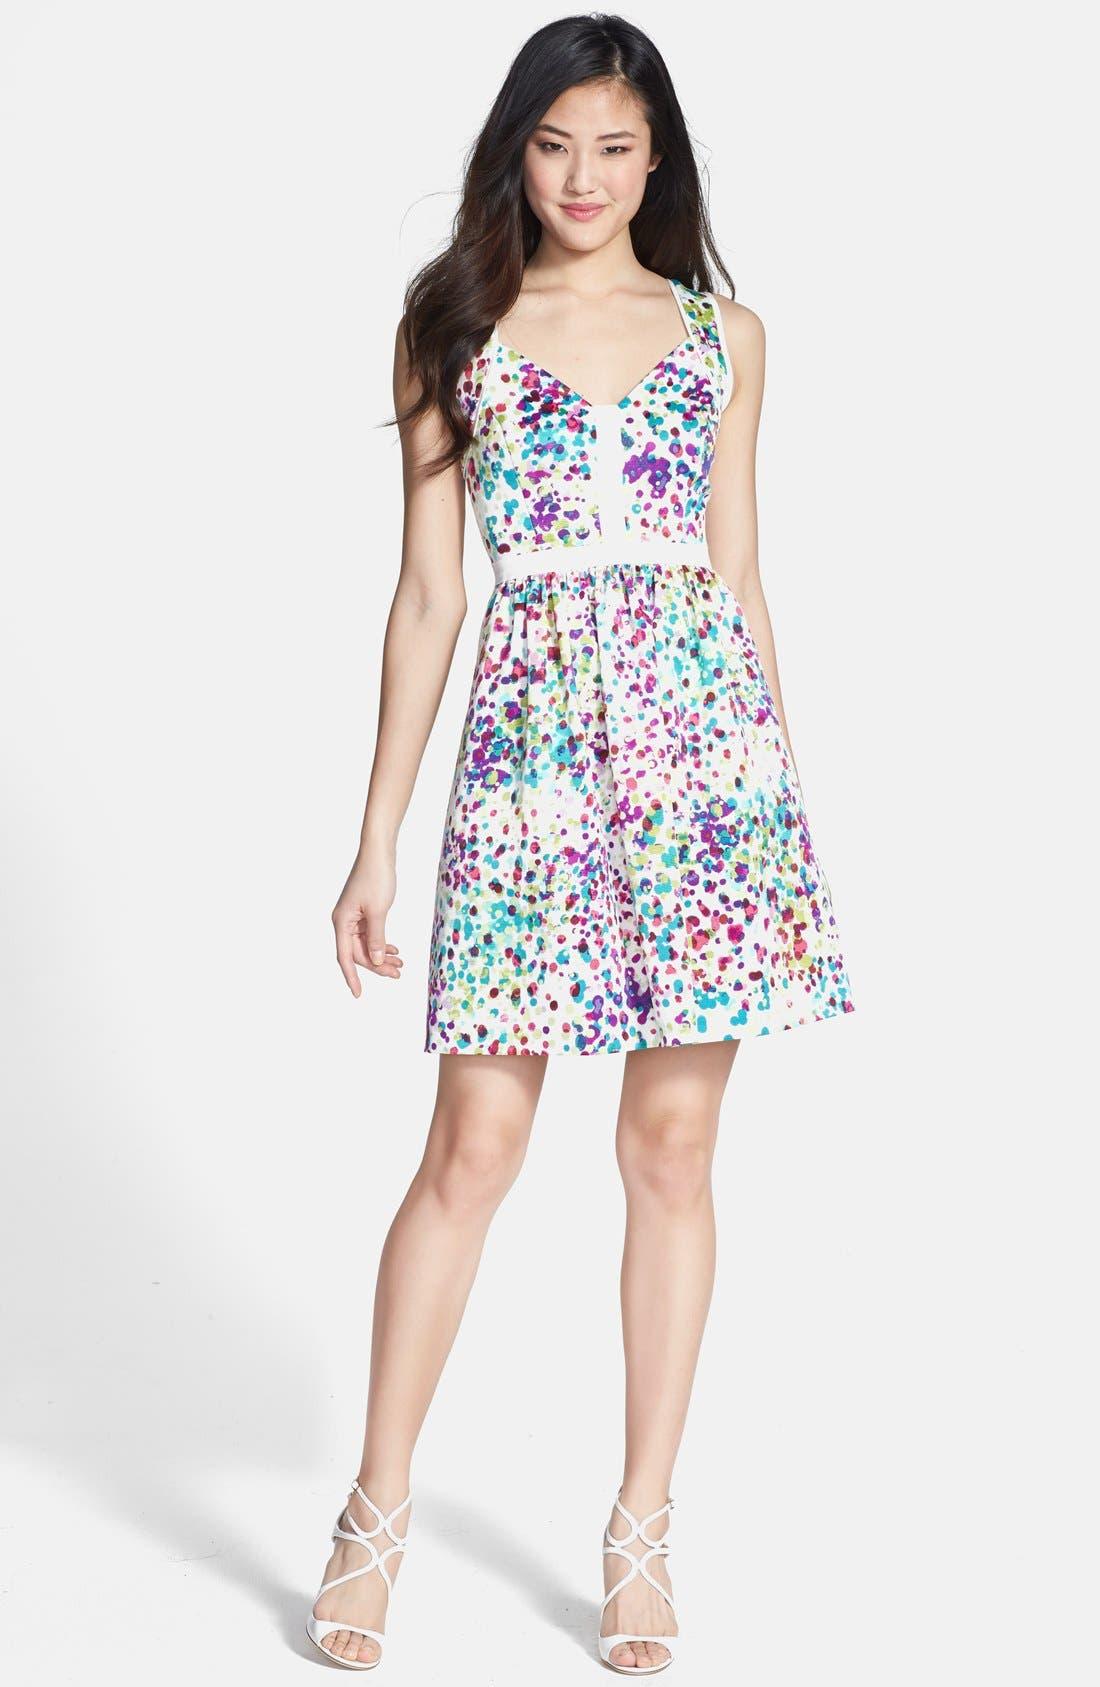 Main Image - Ivy & Blu Print Ottoman Knit Fit & Flare Dress